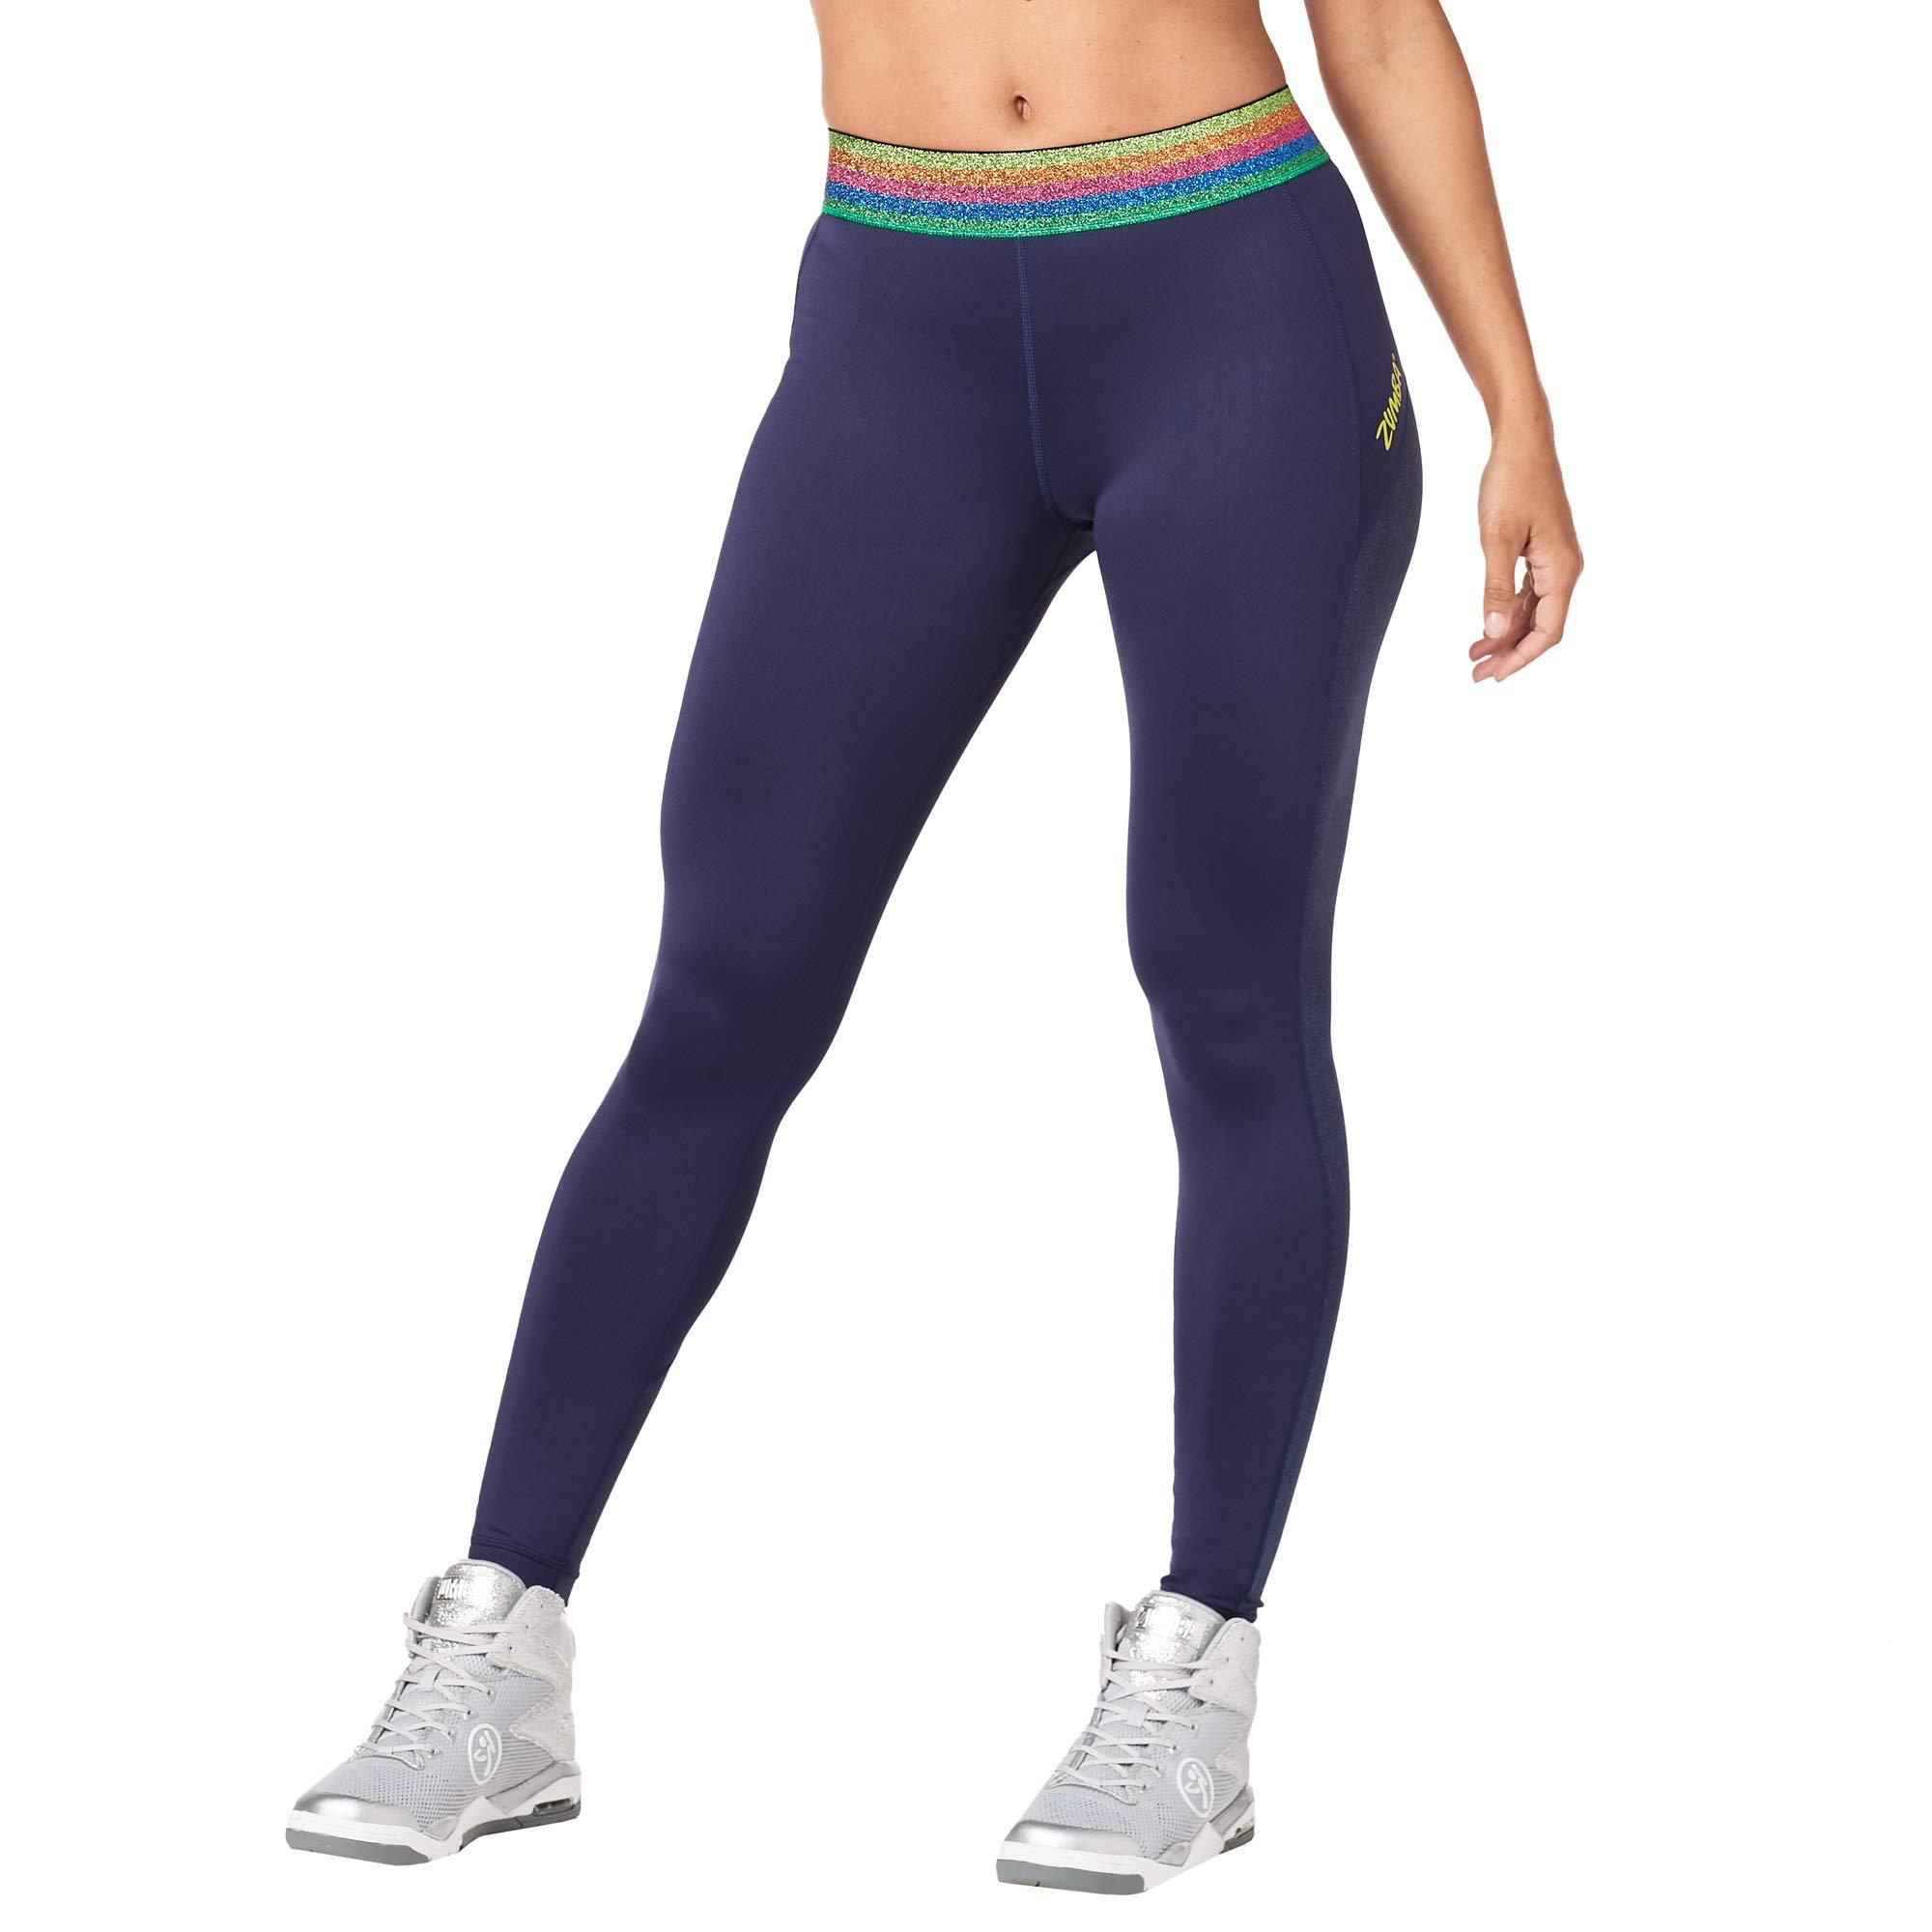 Zumba Dance Workout Wide Jacquard Waistband Leggings For Women